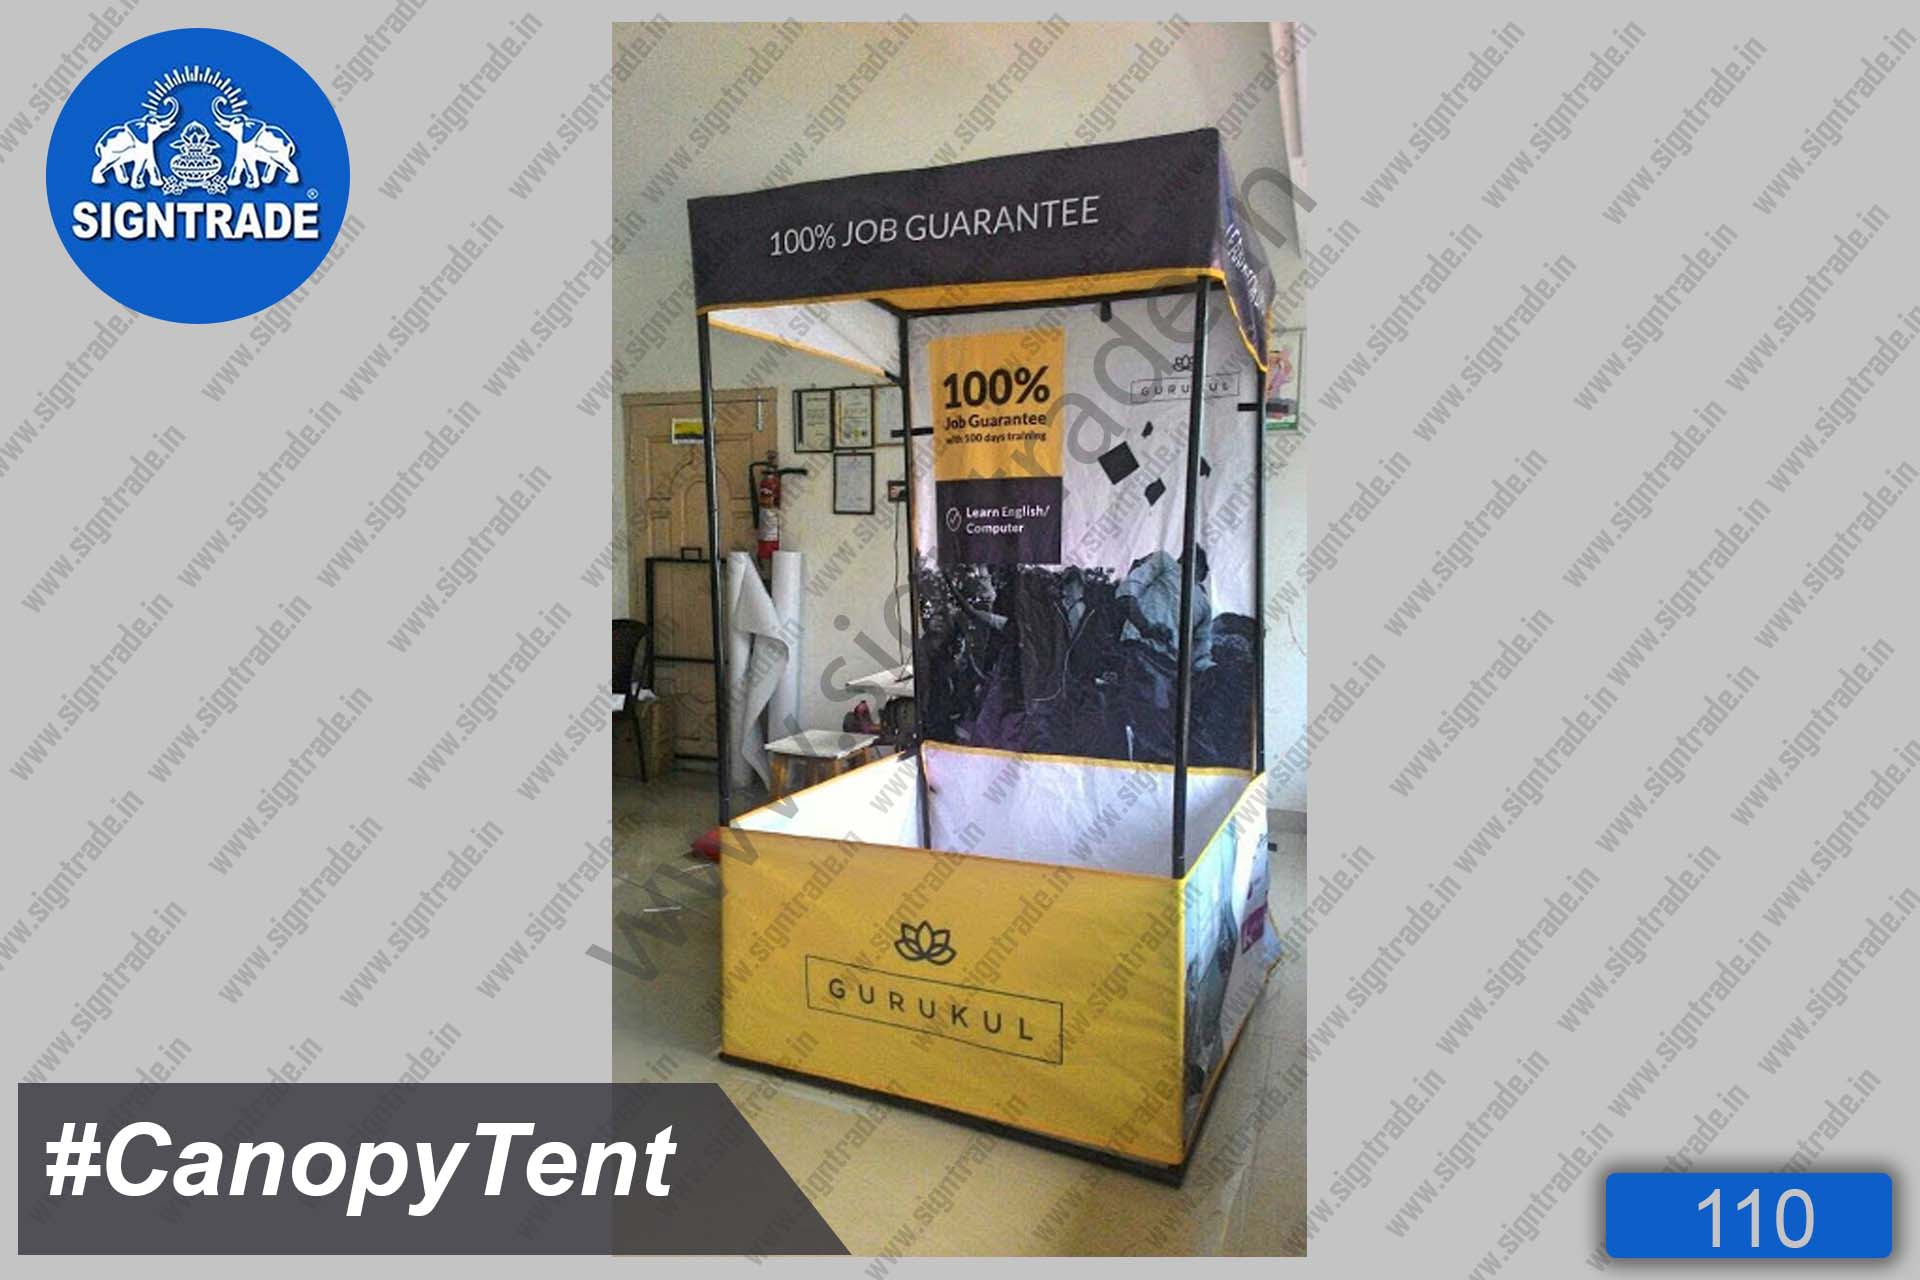 Gurukul Job Consultancy - Canopy Tent, Flat Roof Tent